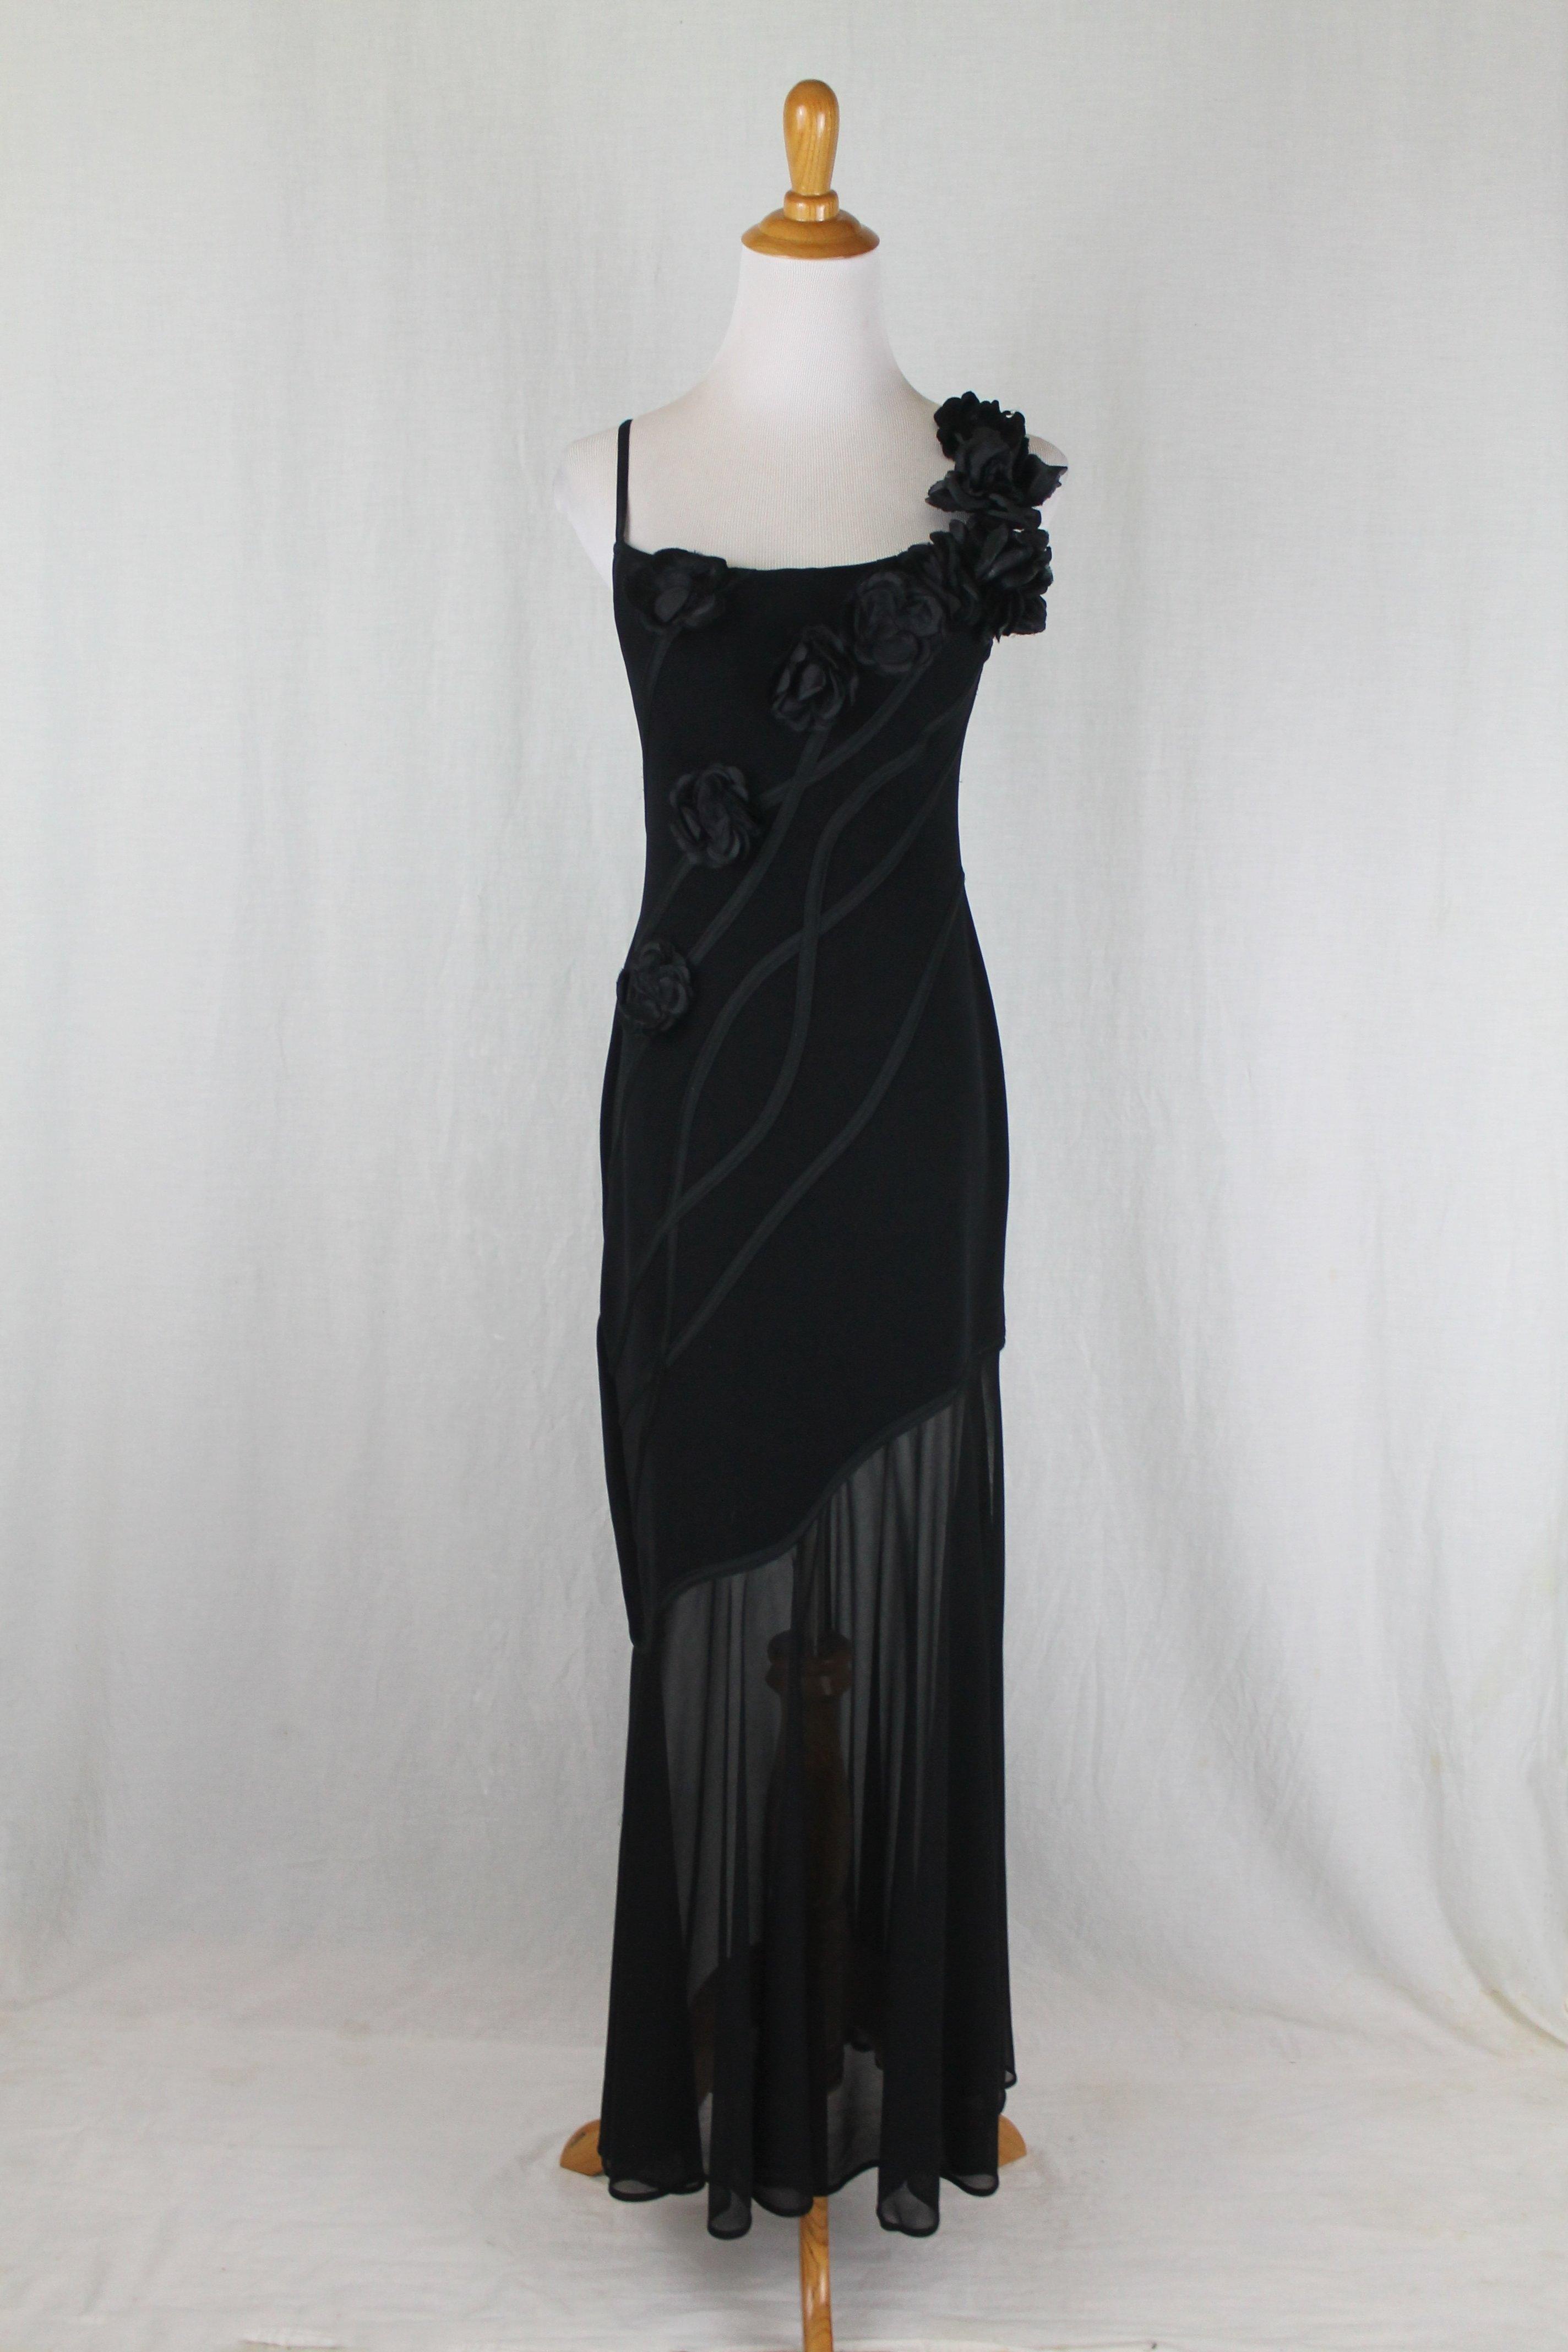 Tadashi Shoji Black Vintage Spaghetti Strap Illusion Evening Gown Long Formal Dress Size Petite 4 S 64 Off Retail Vintage Black Dress Evening Gown Dresses Formal Dresses Long [ 4272 x 2848 Pixel ]